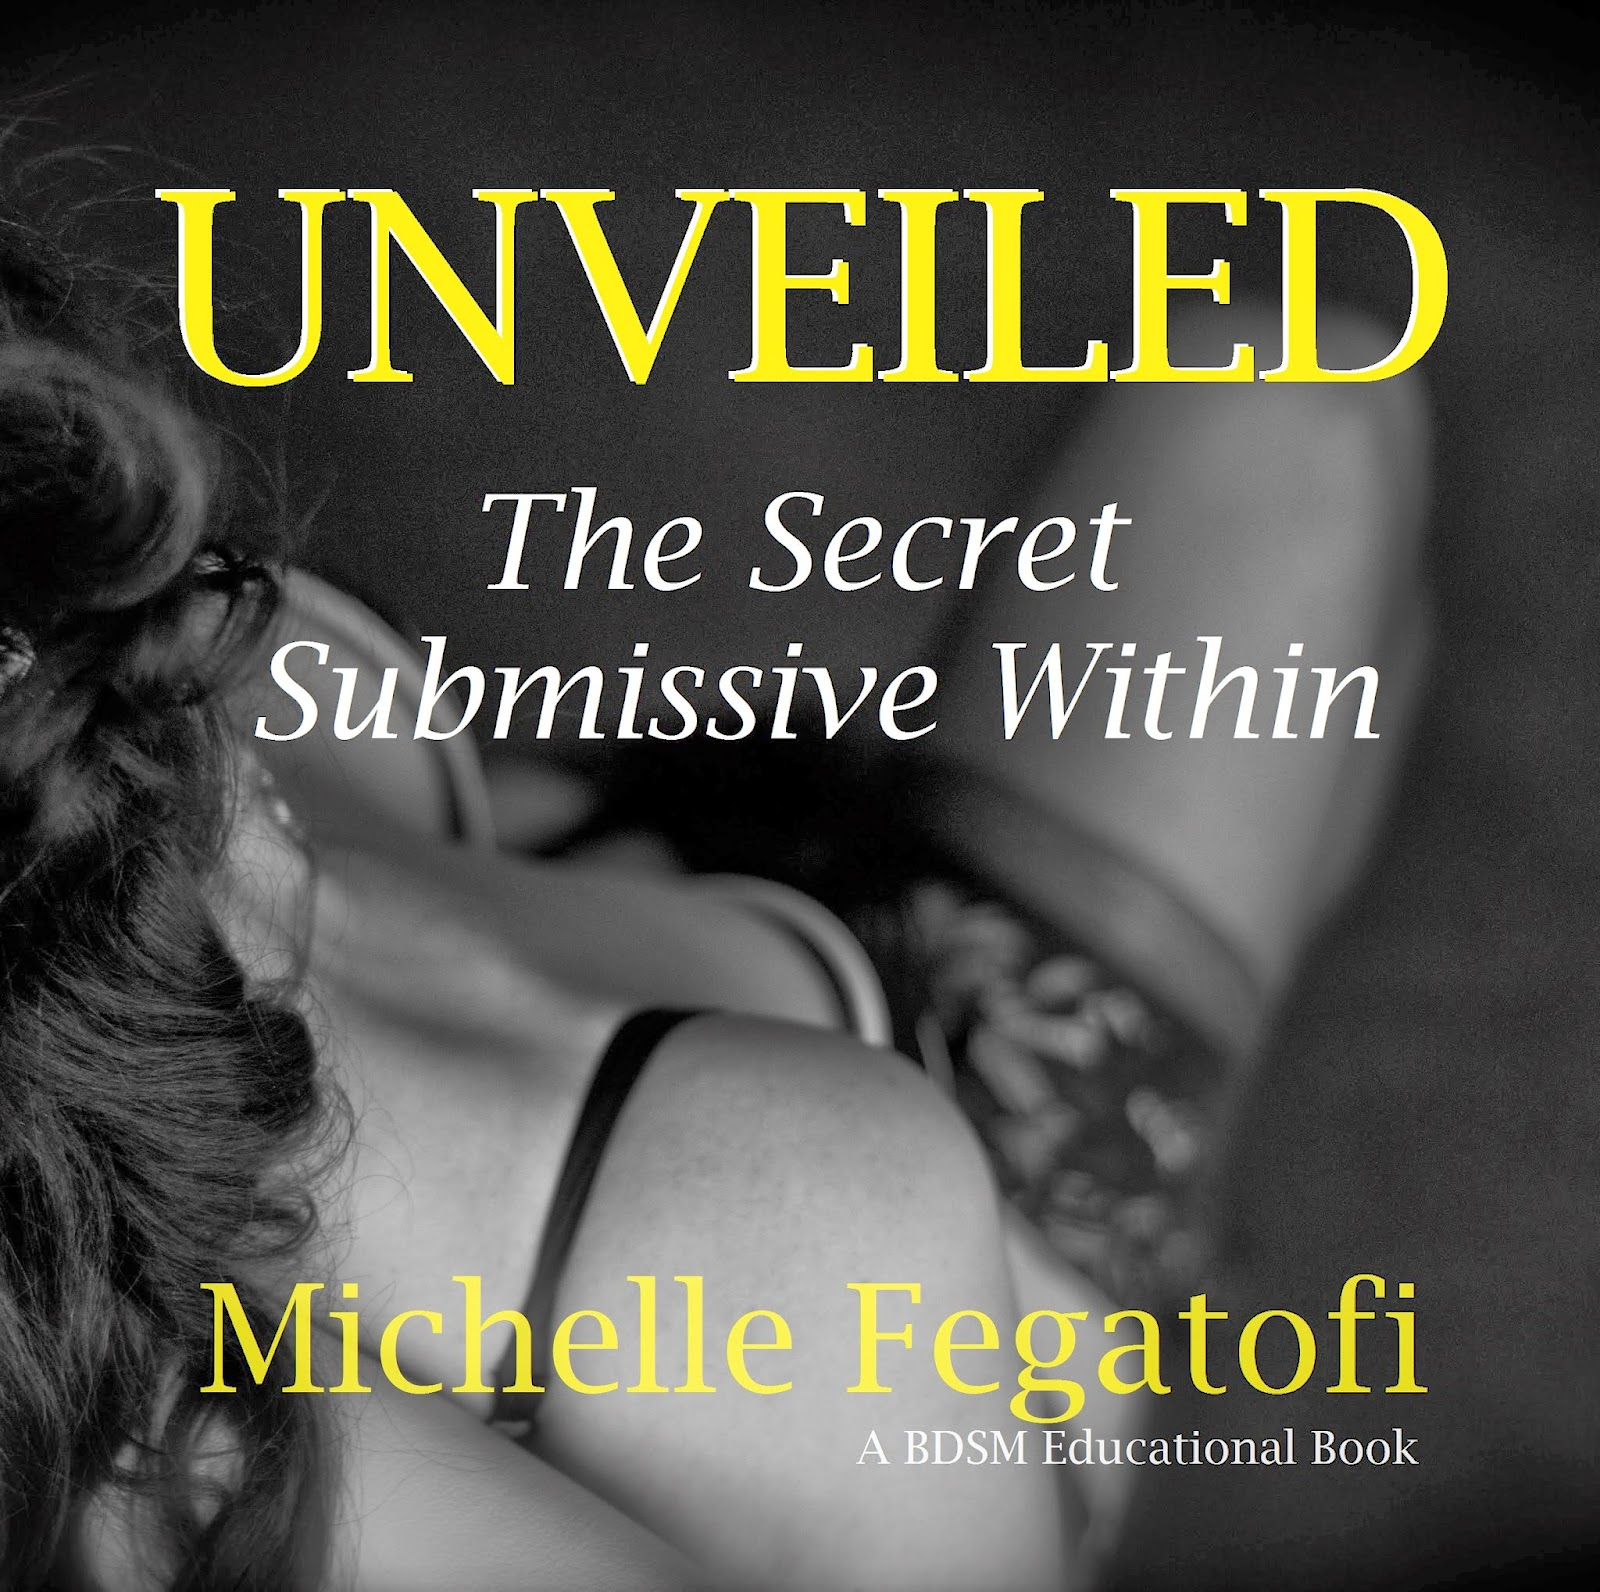 UNVEILED The Secret Submissive Within - a Michelle Fegatofi's BDSM Educational Book